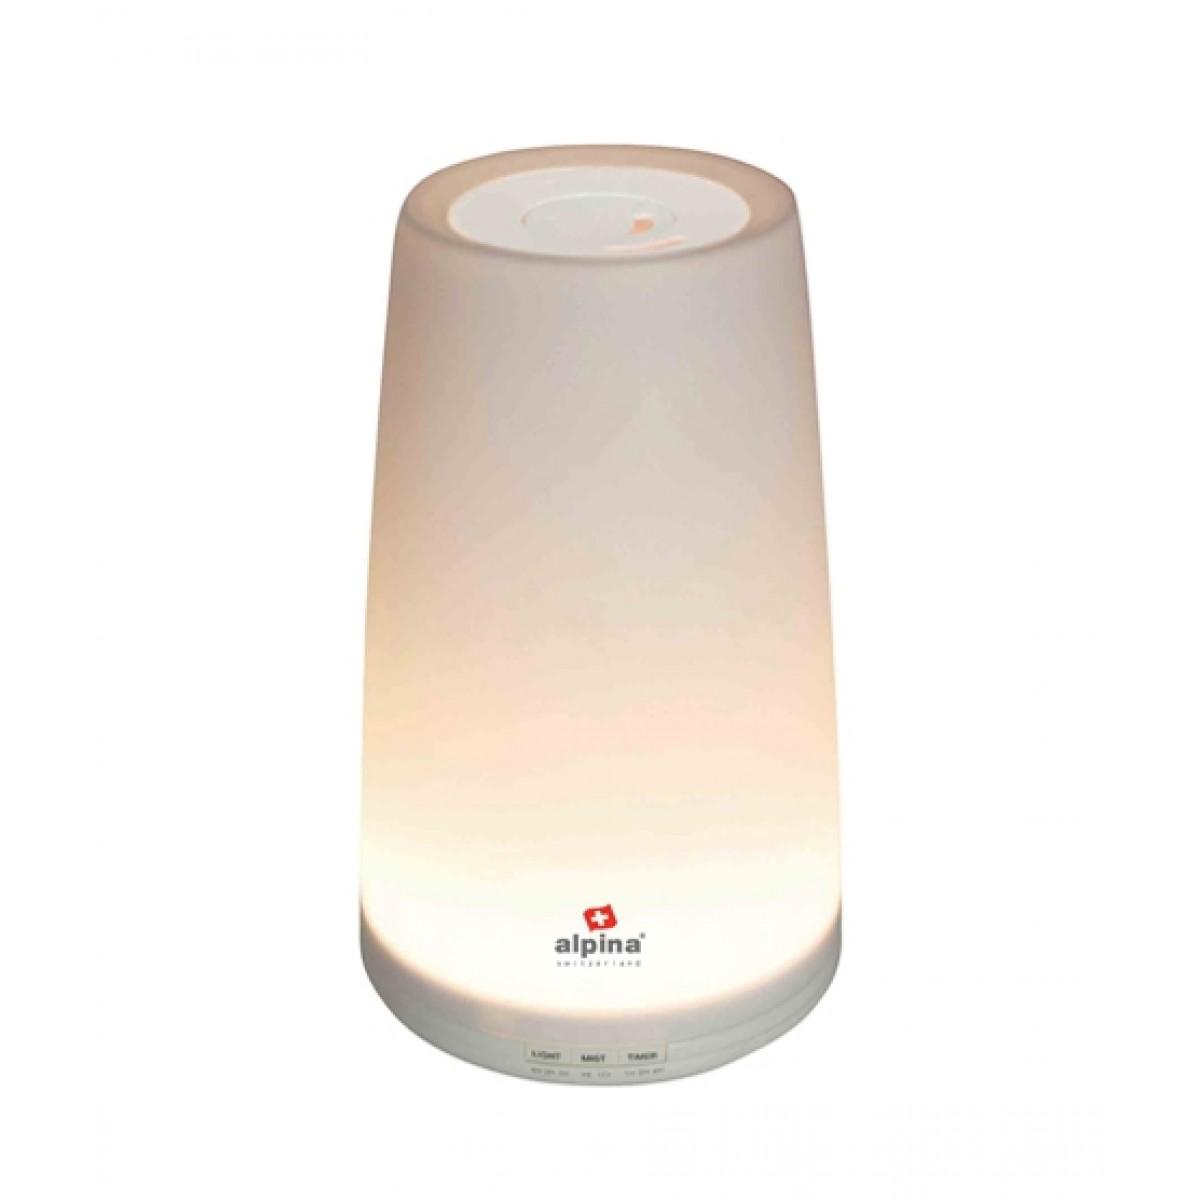 Alpina Table Lamp Aroma Humidifier (SF-5060)